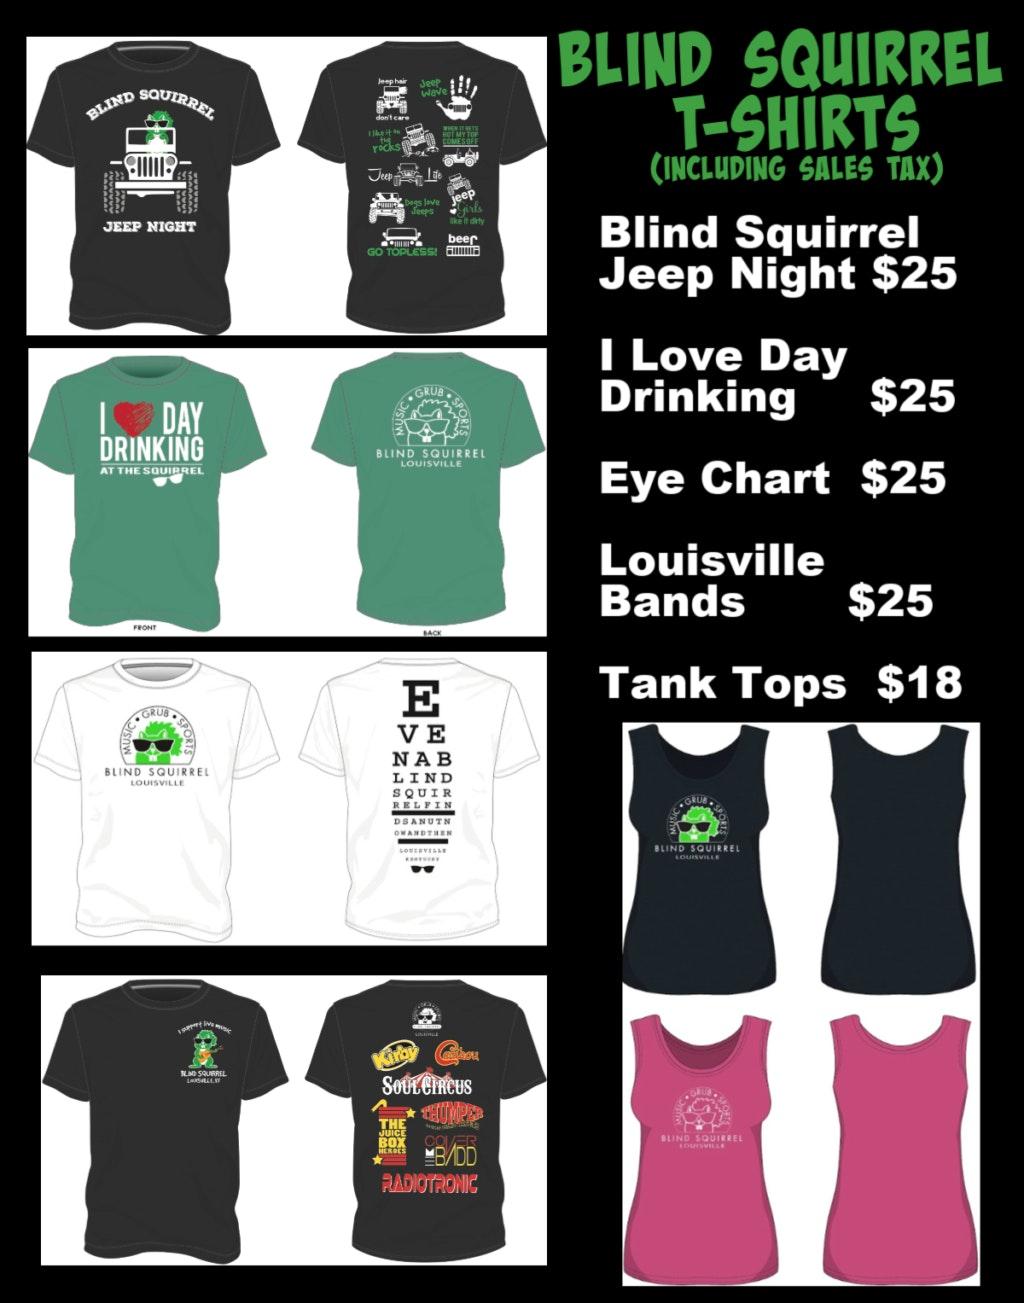 T-Shirts pricing list